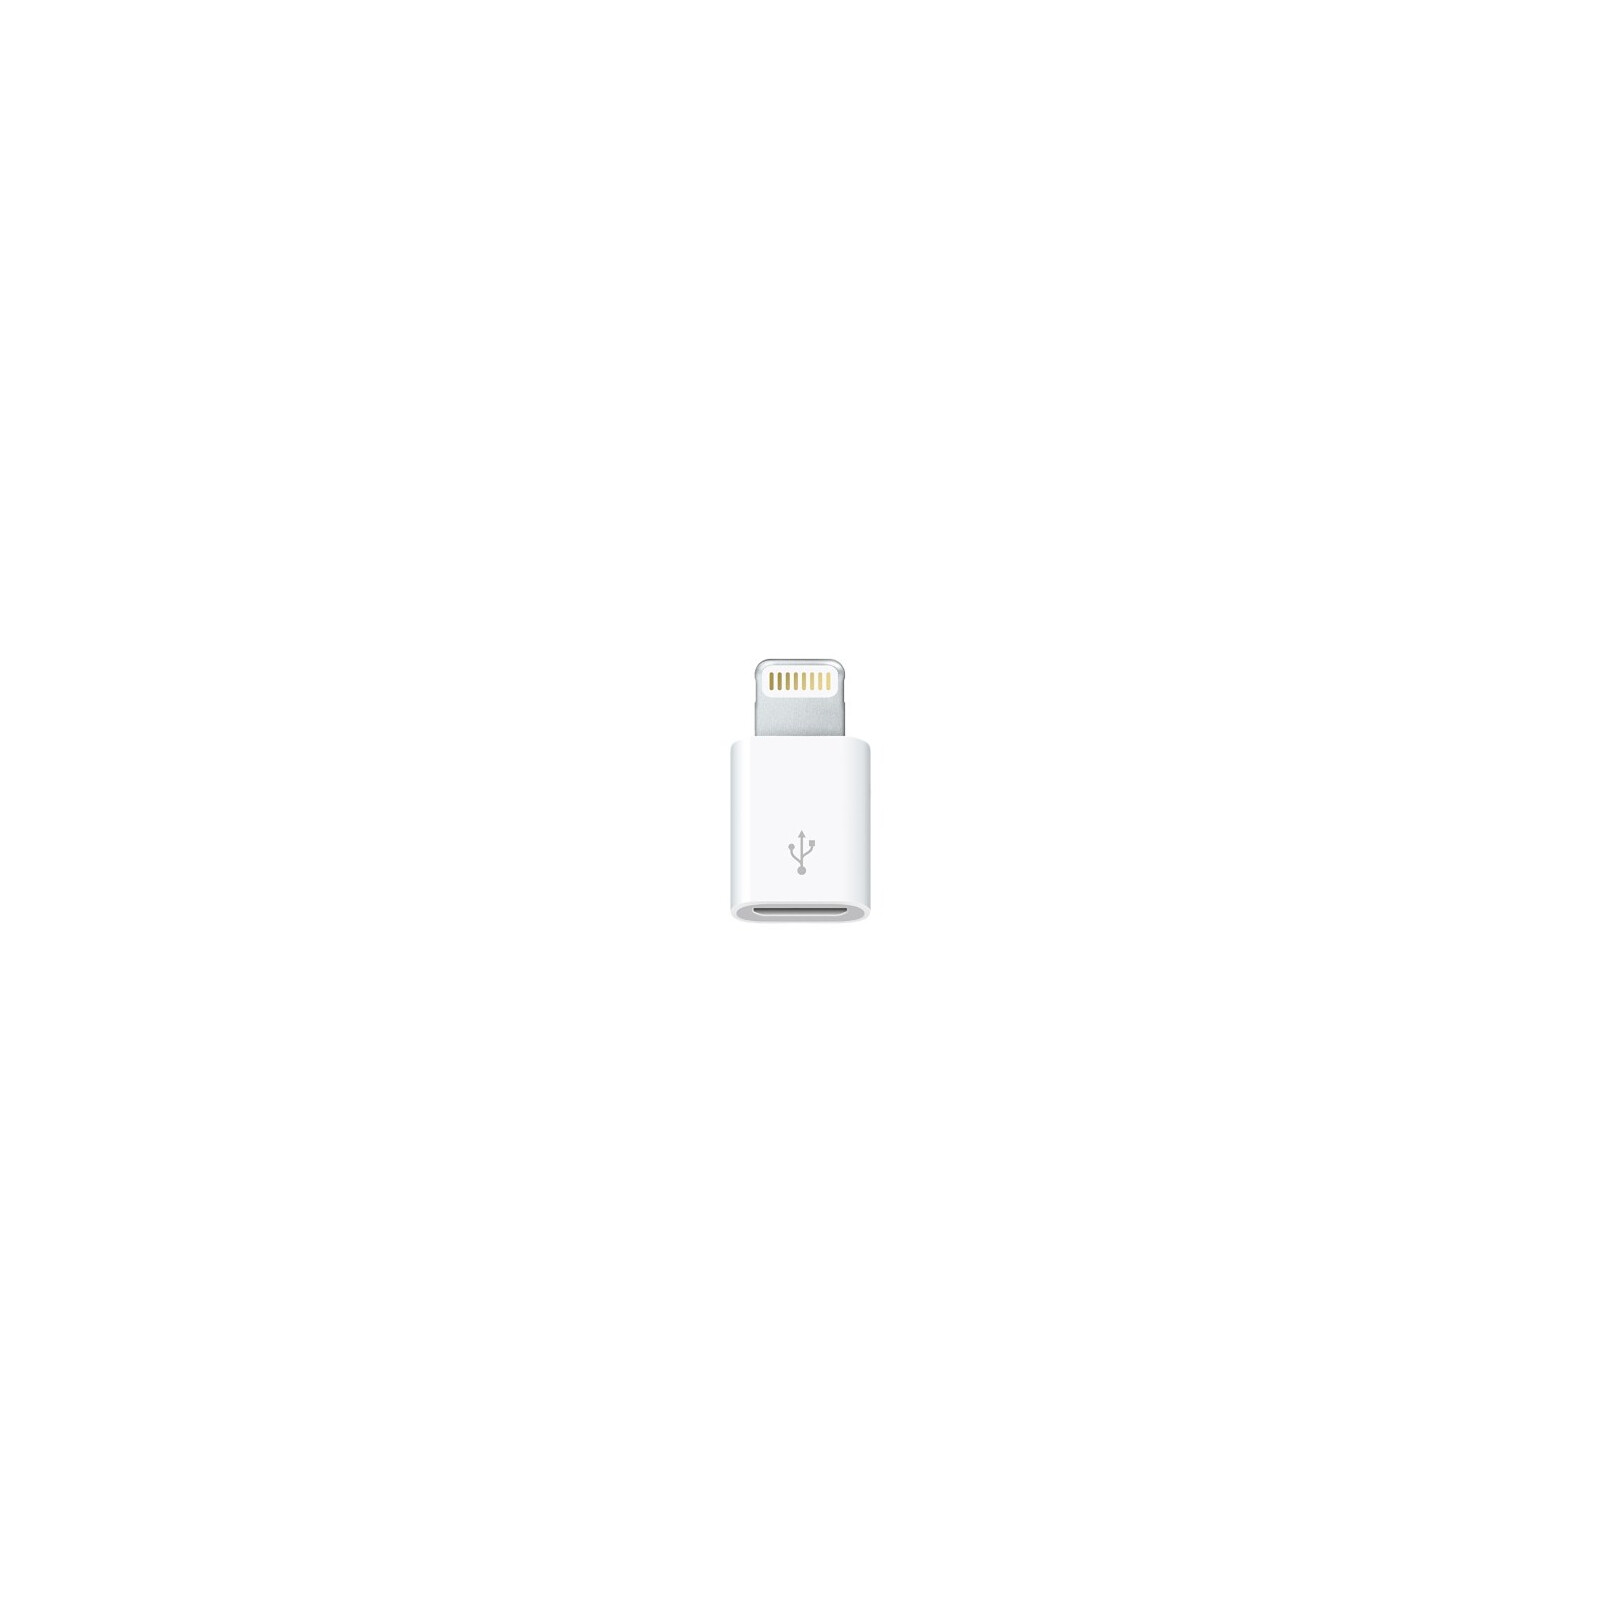 Apple Lightning/Micro USB Adapter